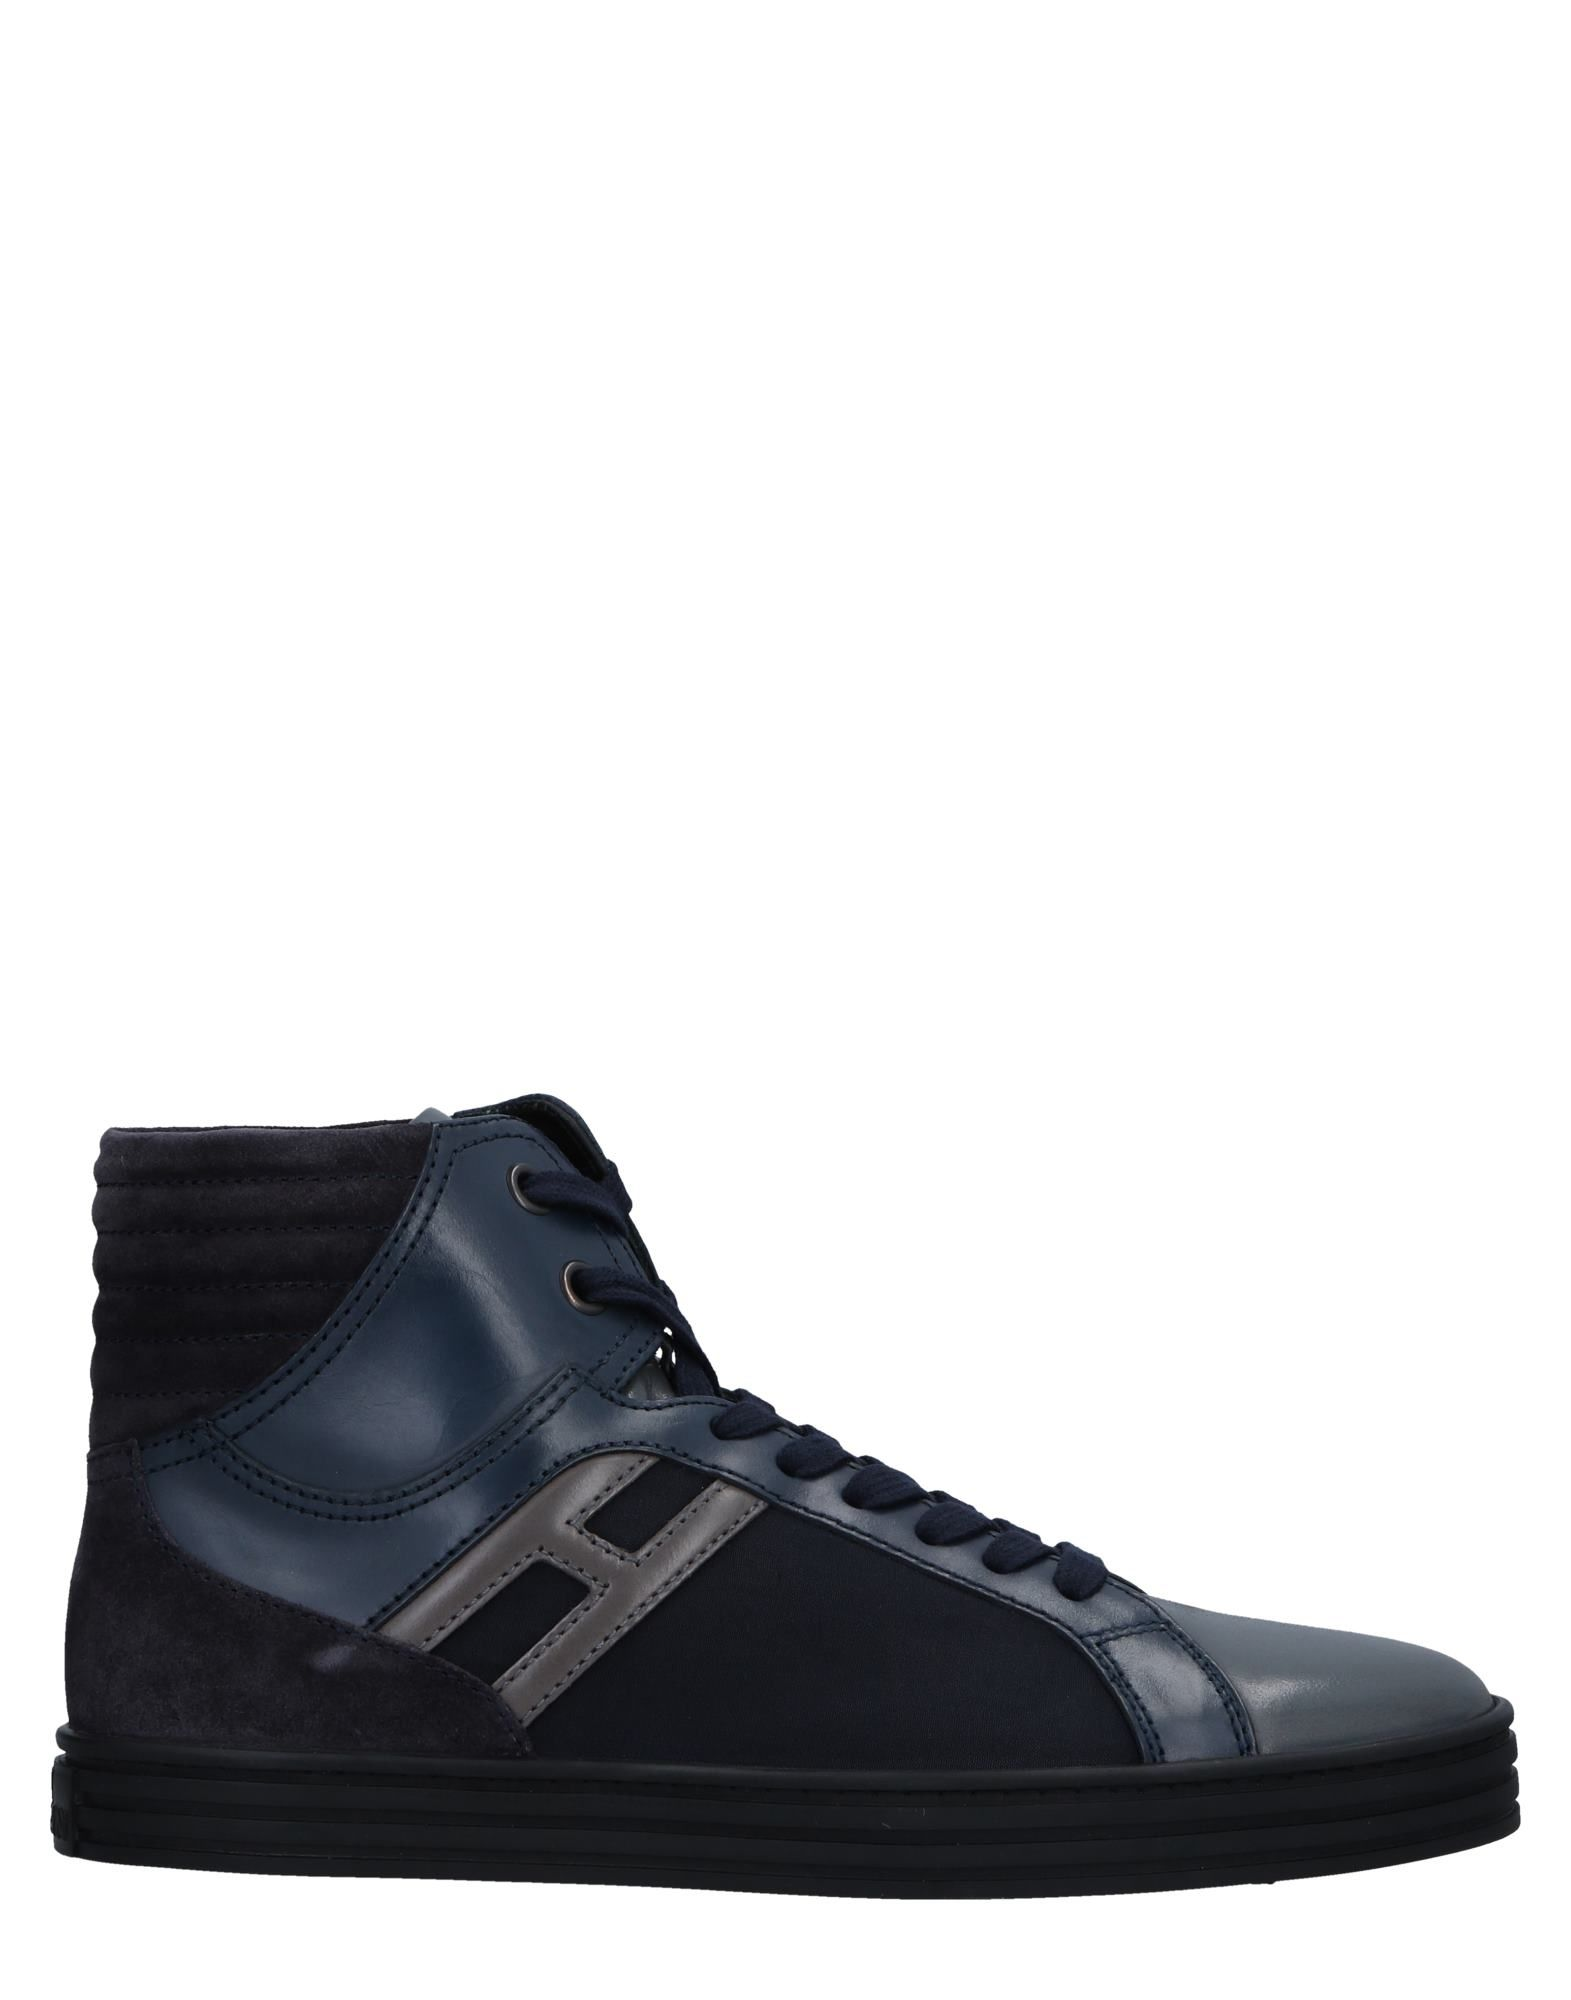 Hogan Rebel Sneakers Herren  11517081AE Gute Qualität beliebte Schuhe